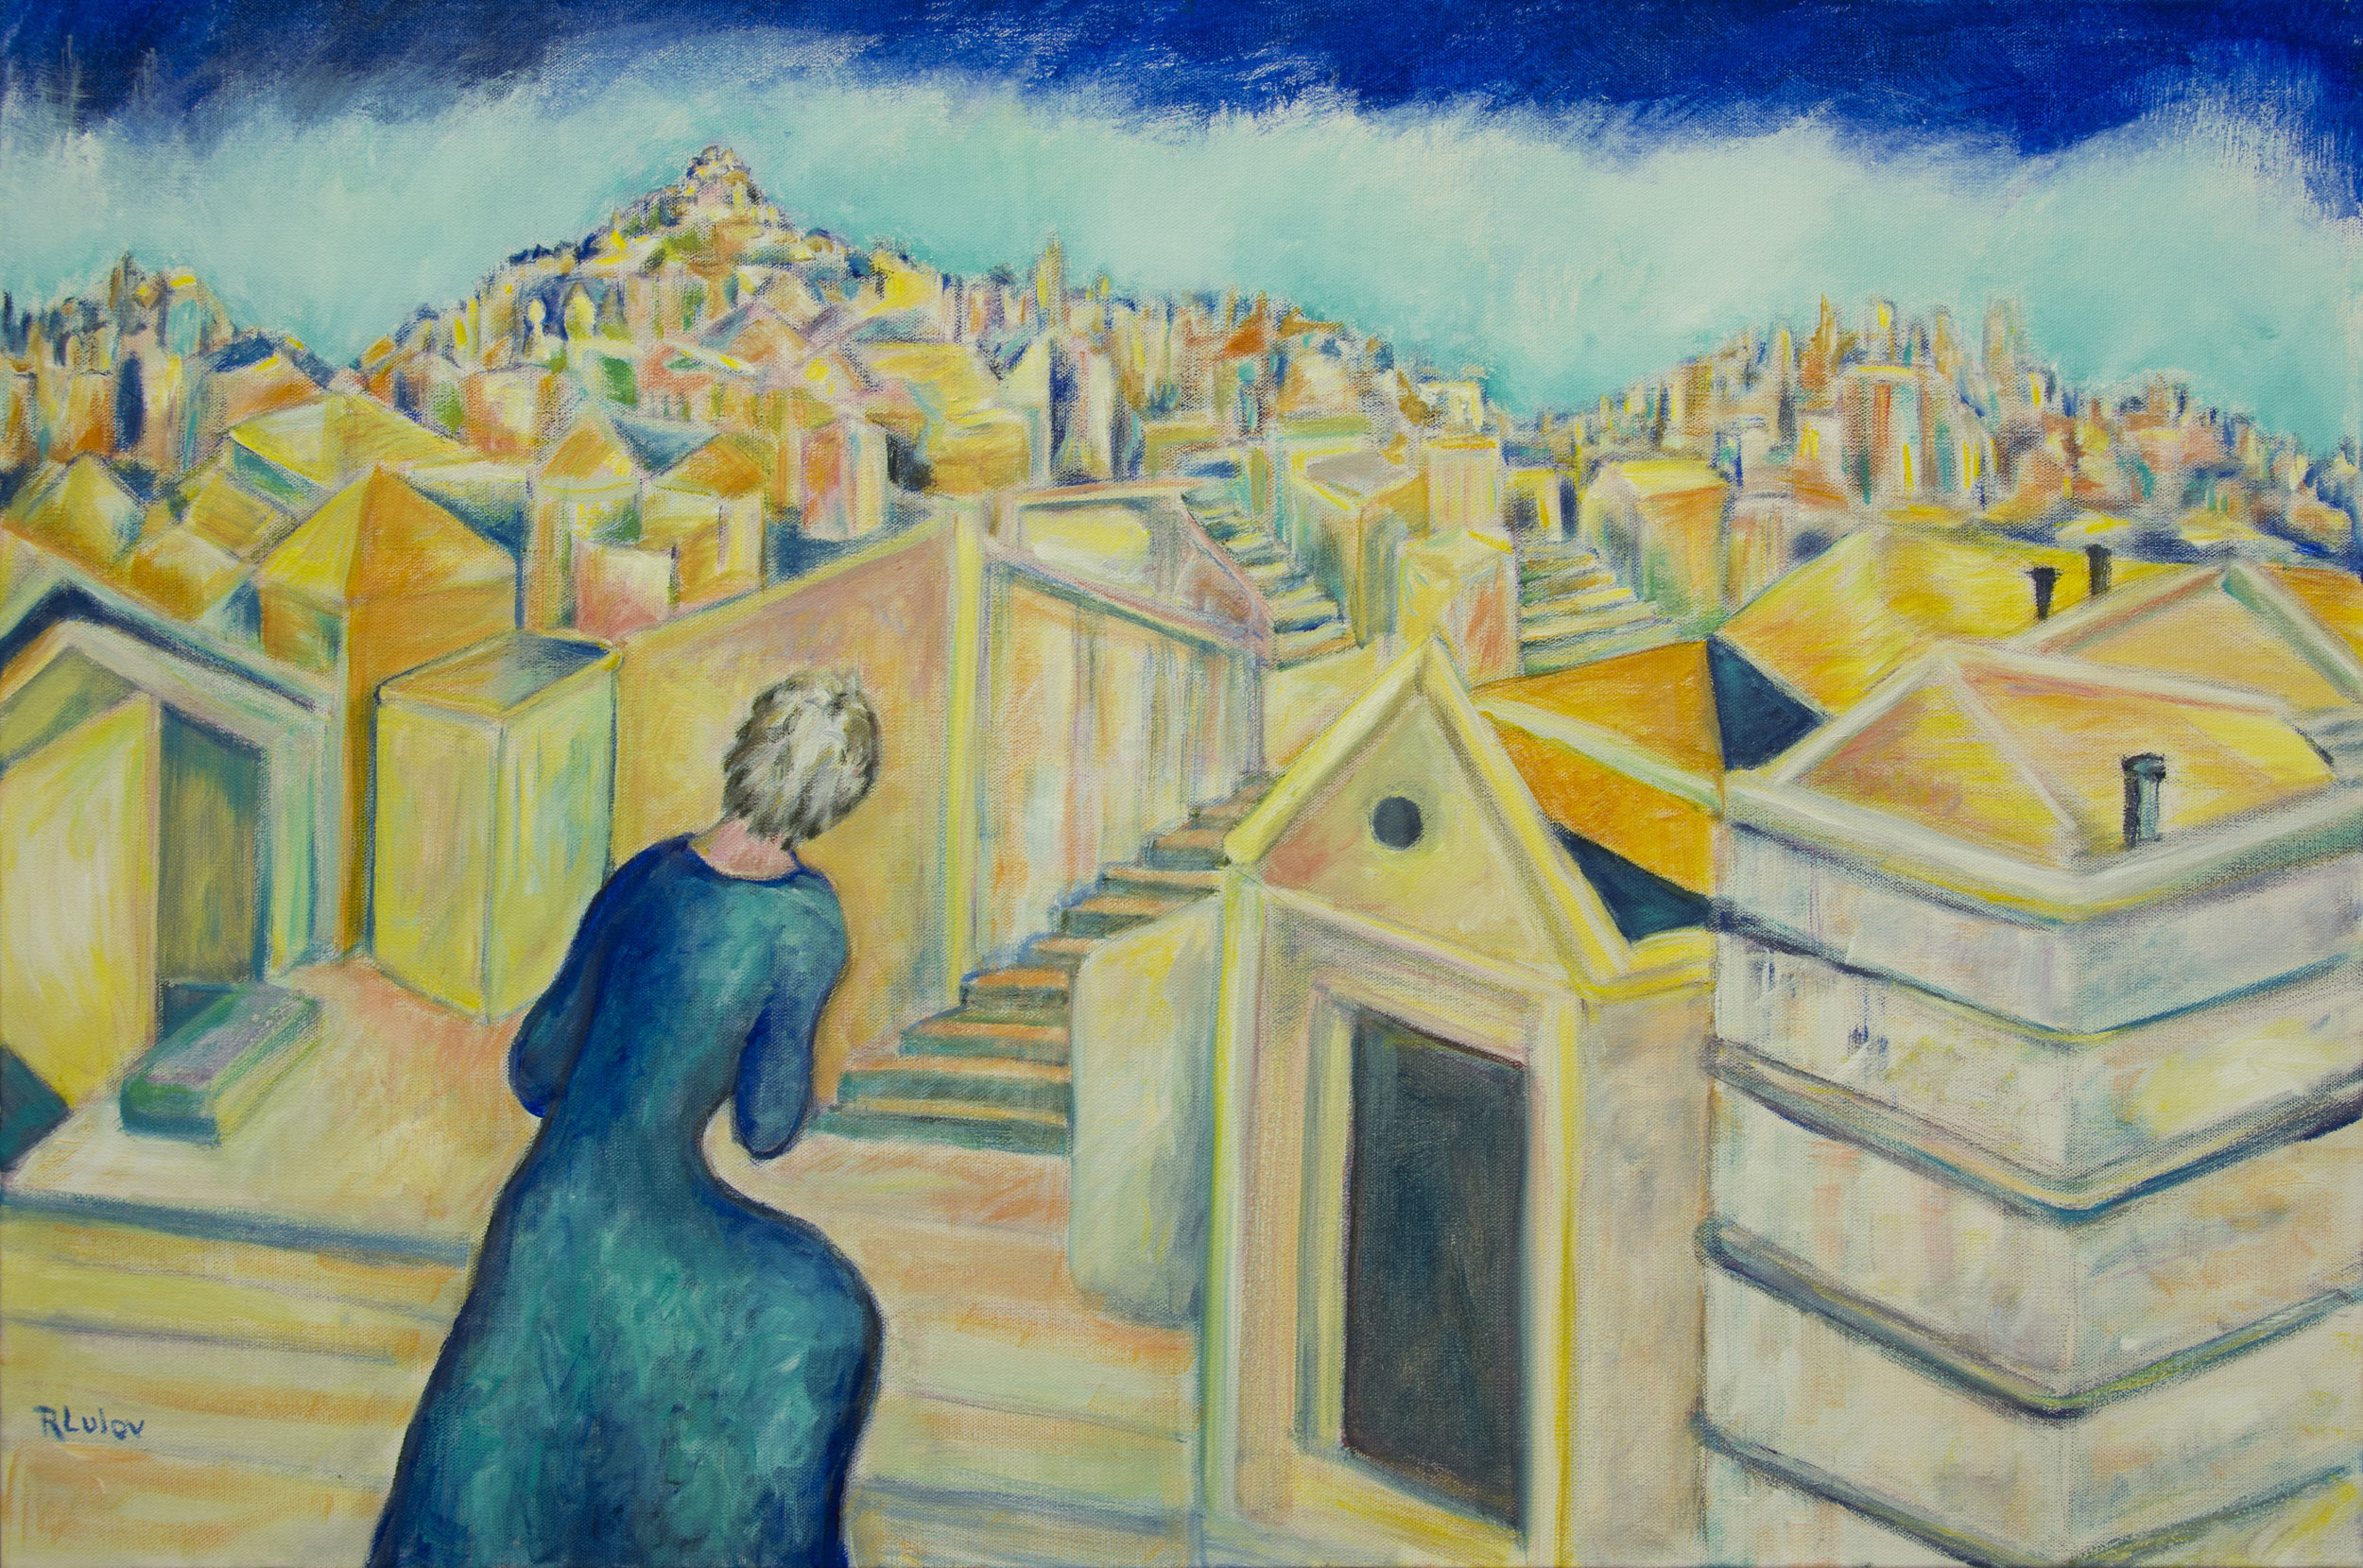 "Dream Labyrinth City acrylic on canvas 24"" x 36"" Rachel Lulov Segall"